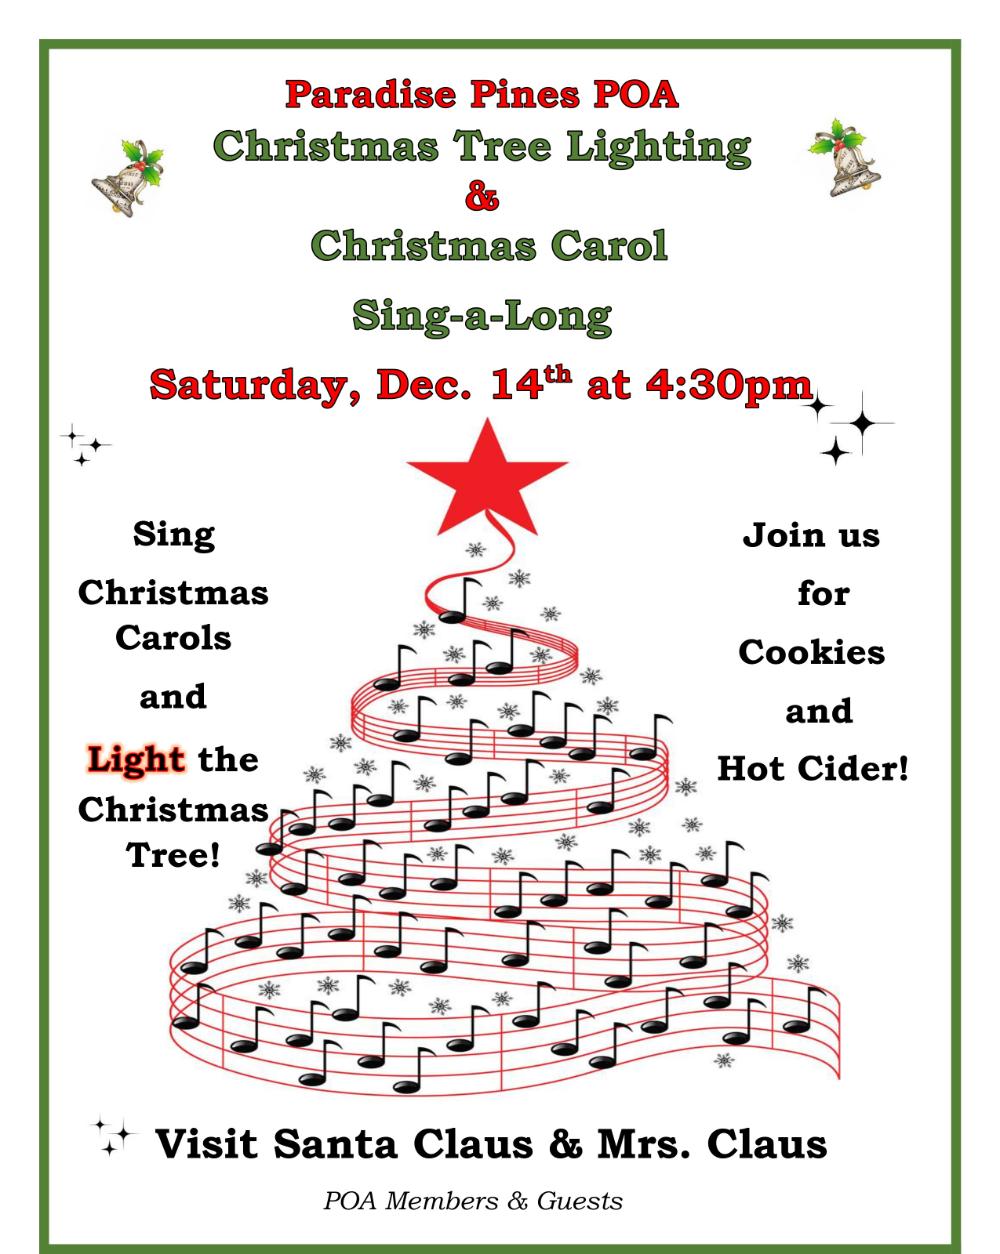 Paradise Pines Poa Home Page Christmas Tree Lighting Carols Cookies Hot Cider